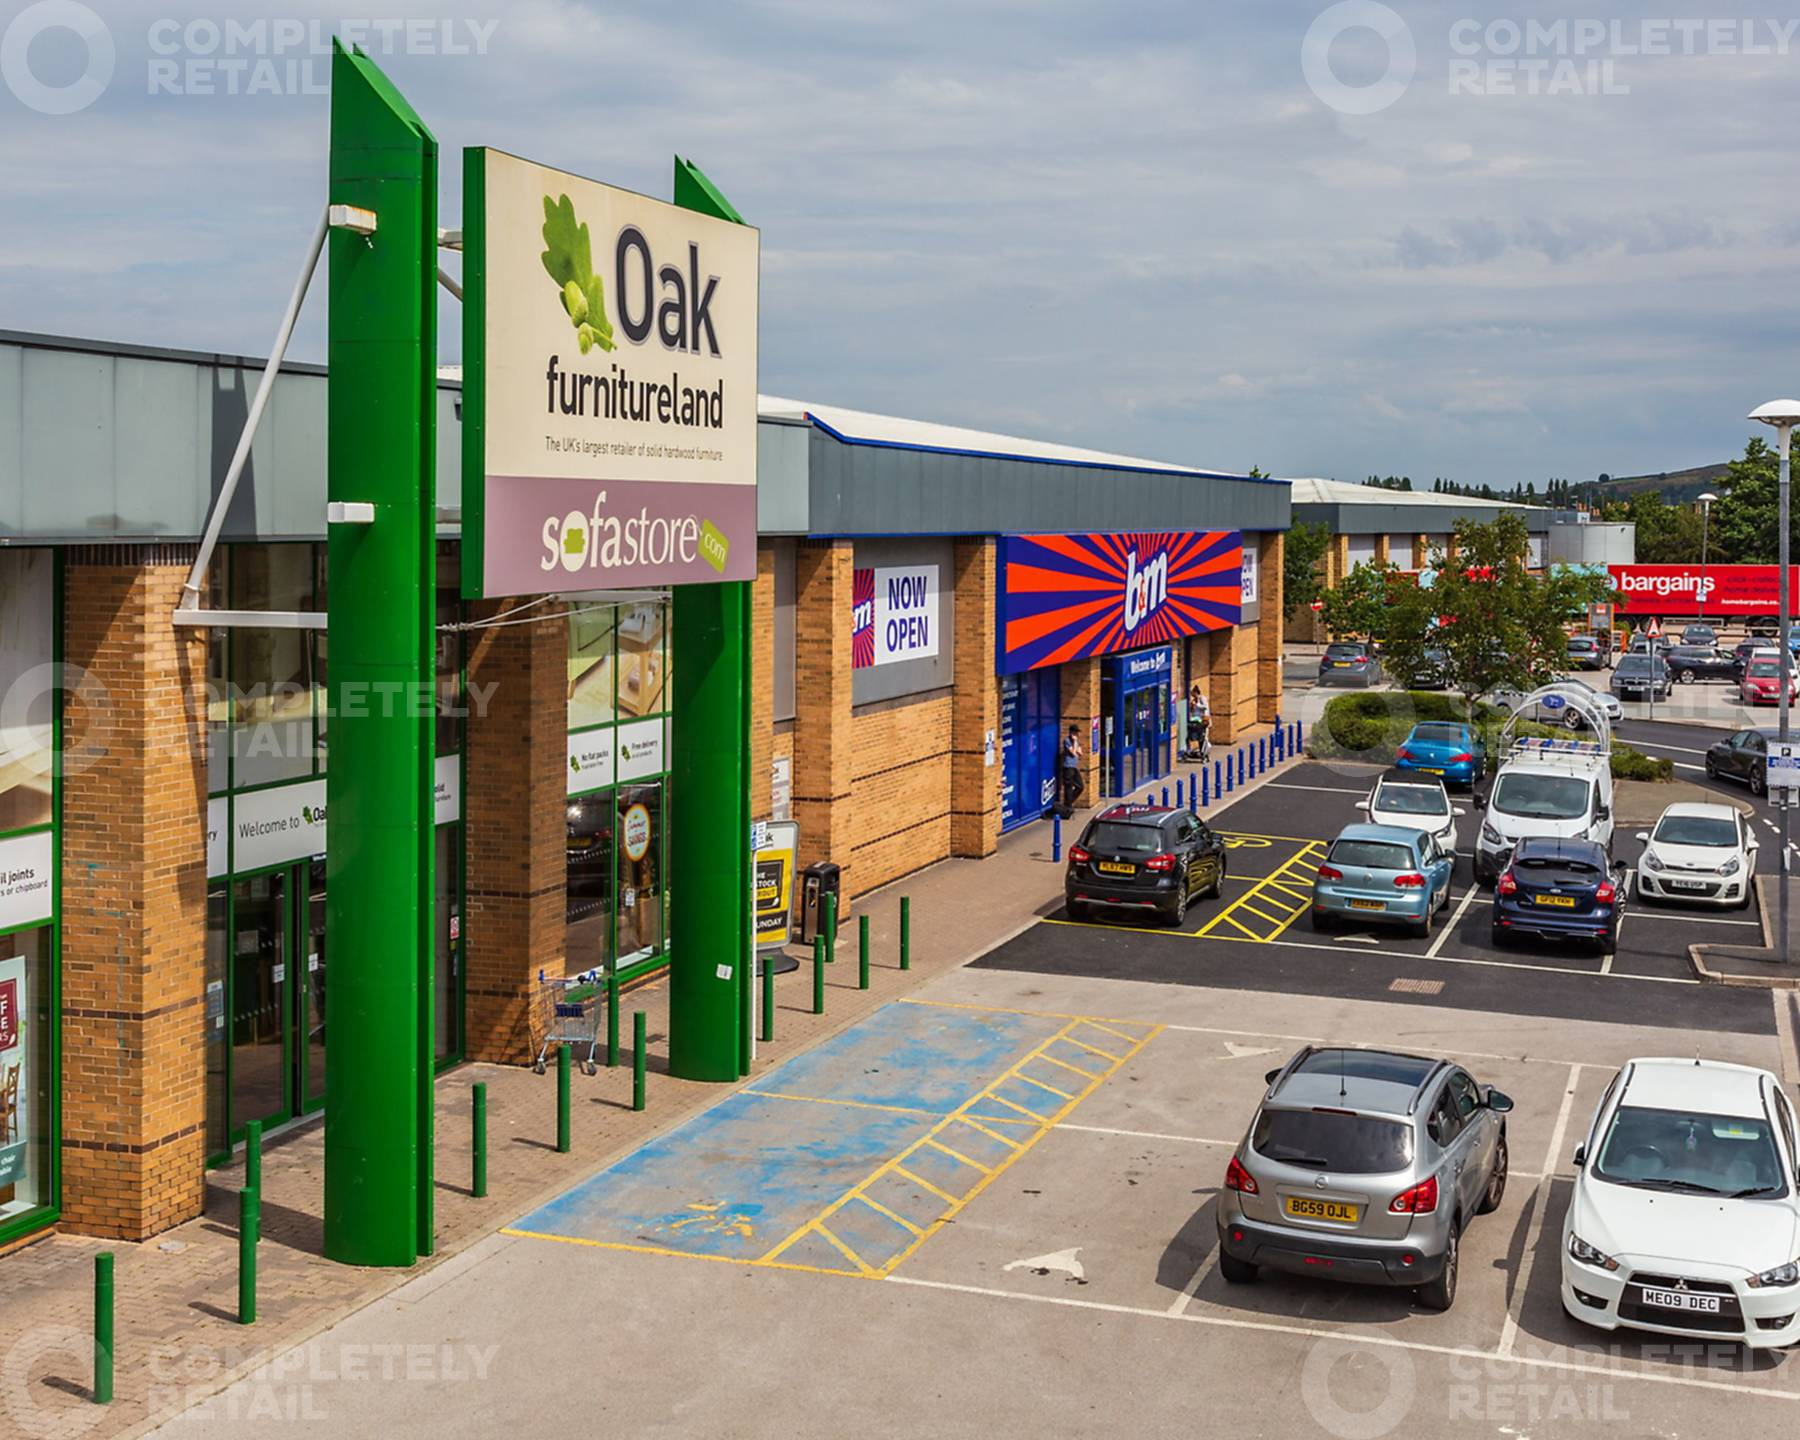 Leeds Road Retail Park